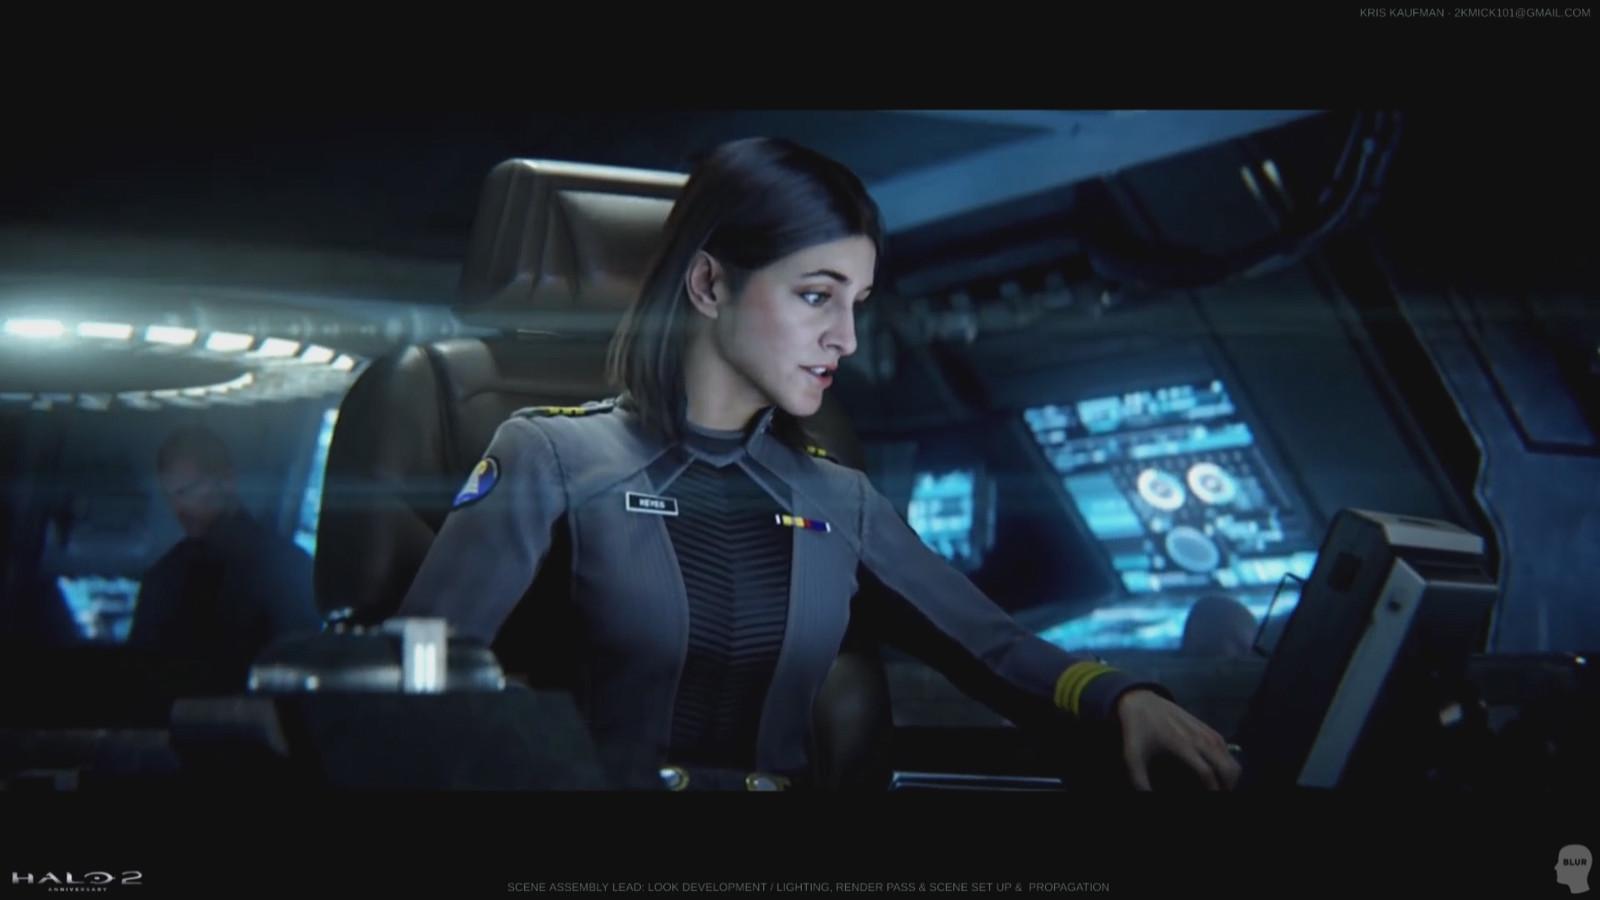 Halo 2 / Anniversary: Look Development / Lighting